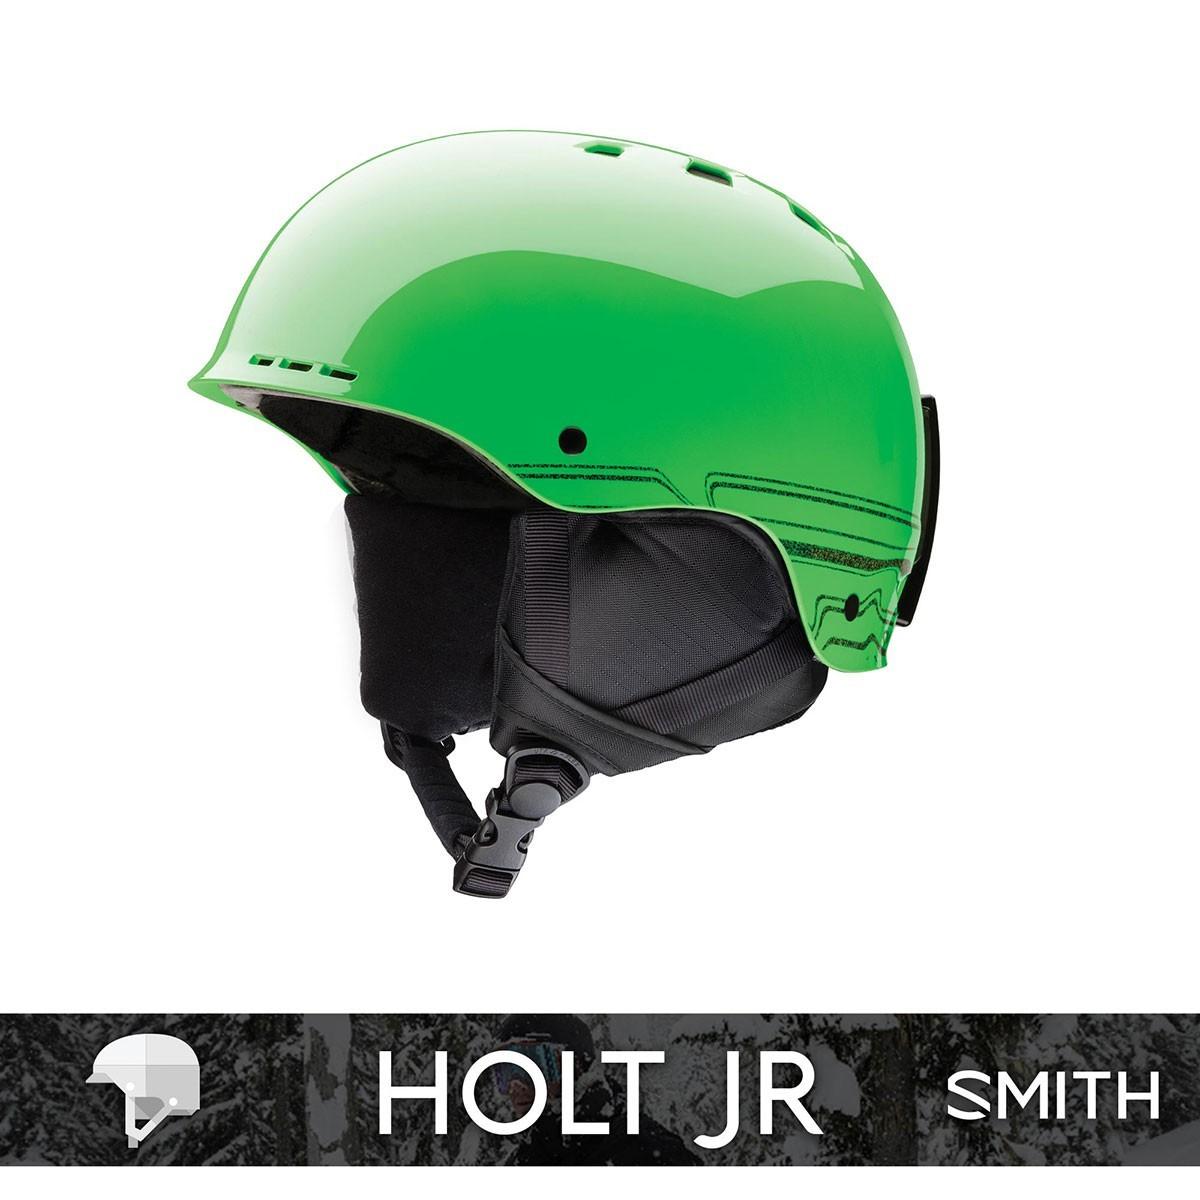 SMITH HOLT JR Reactor Tracking - Изображение - AQUAMATRIX